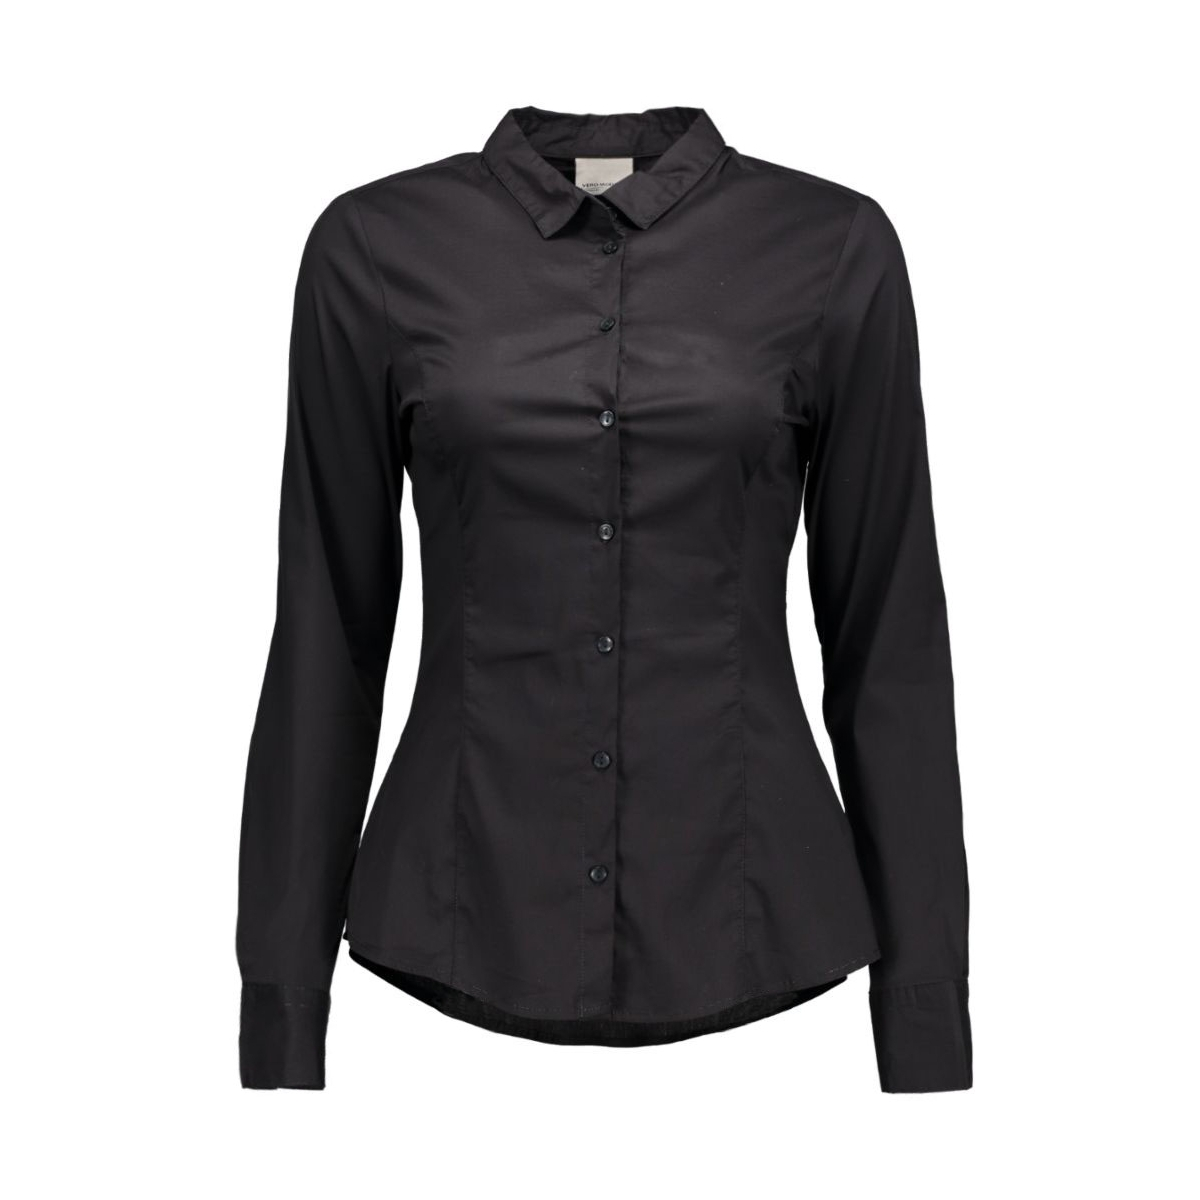 vmlady l/s shirt 10145524 vero moda blouse black